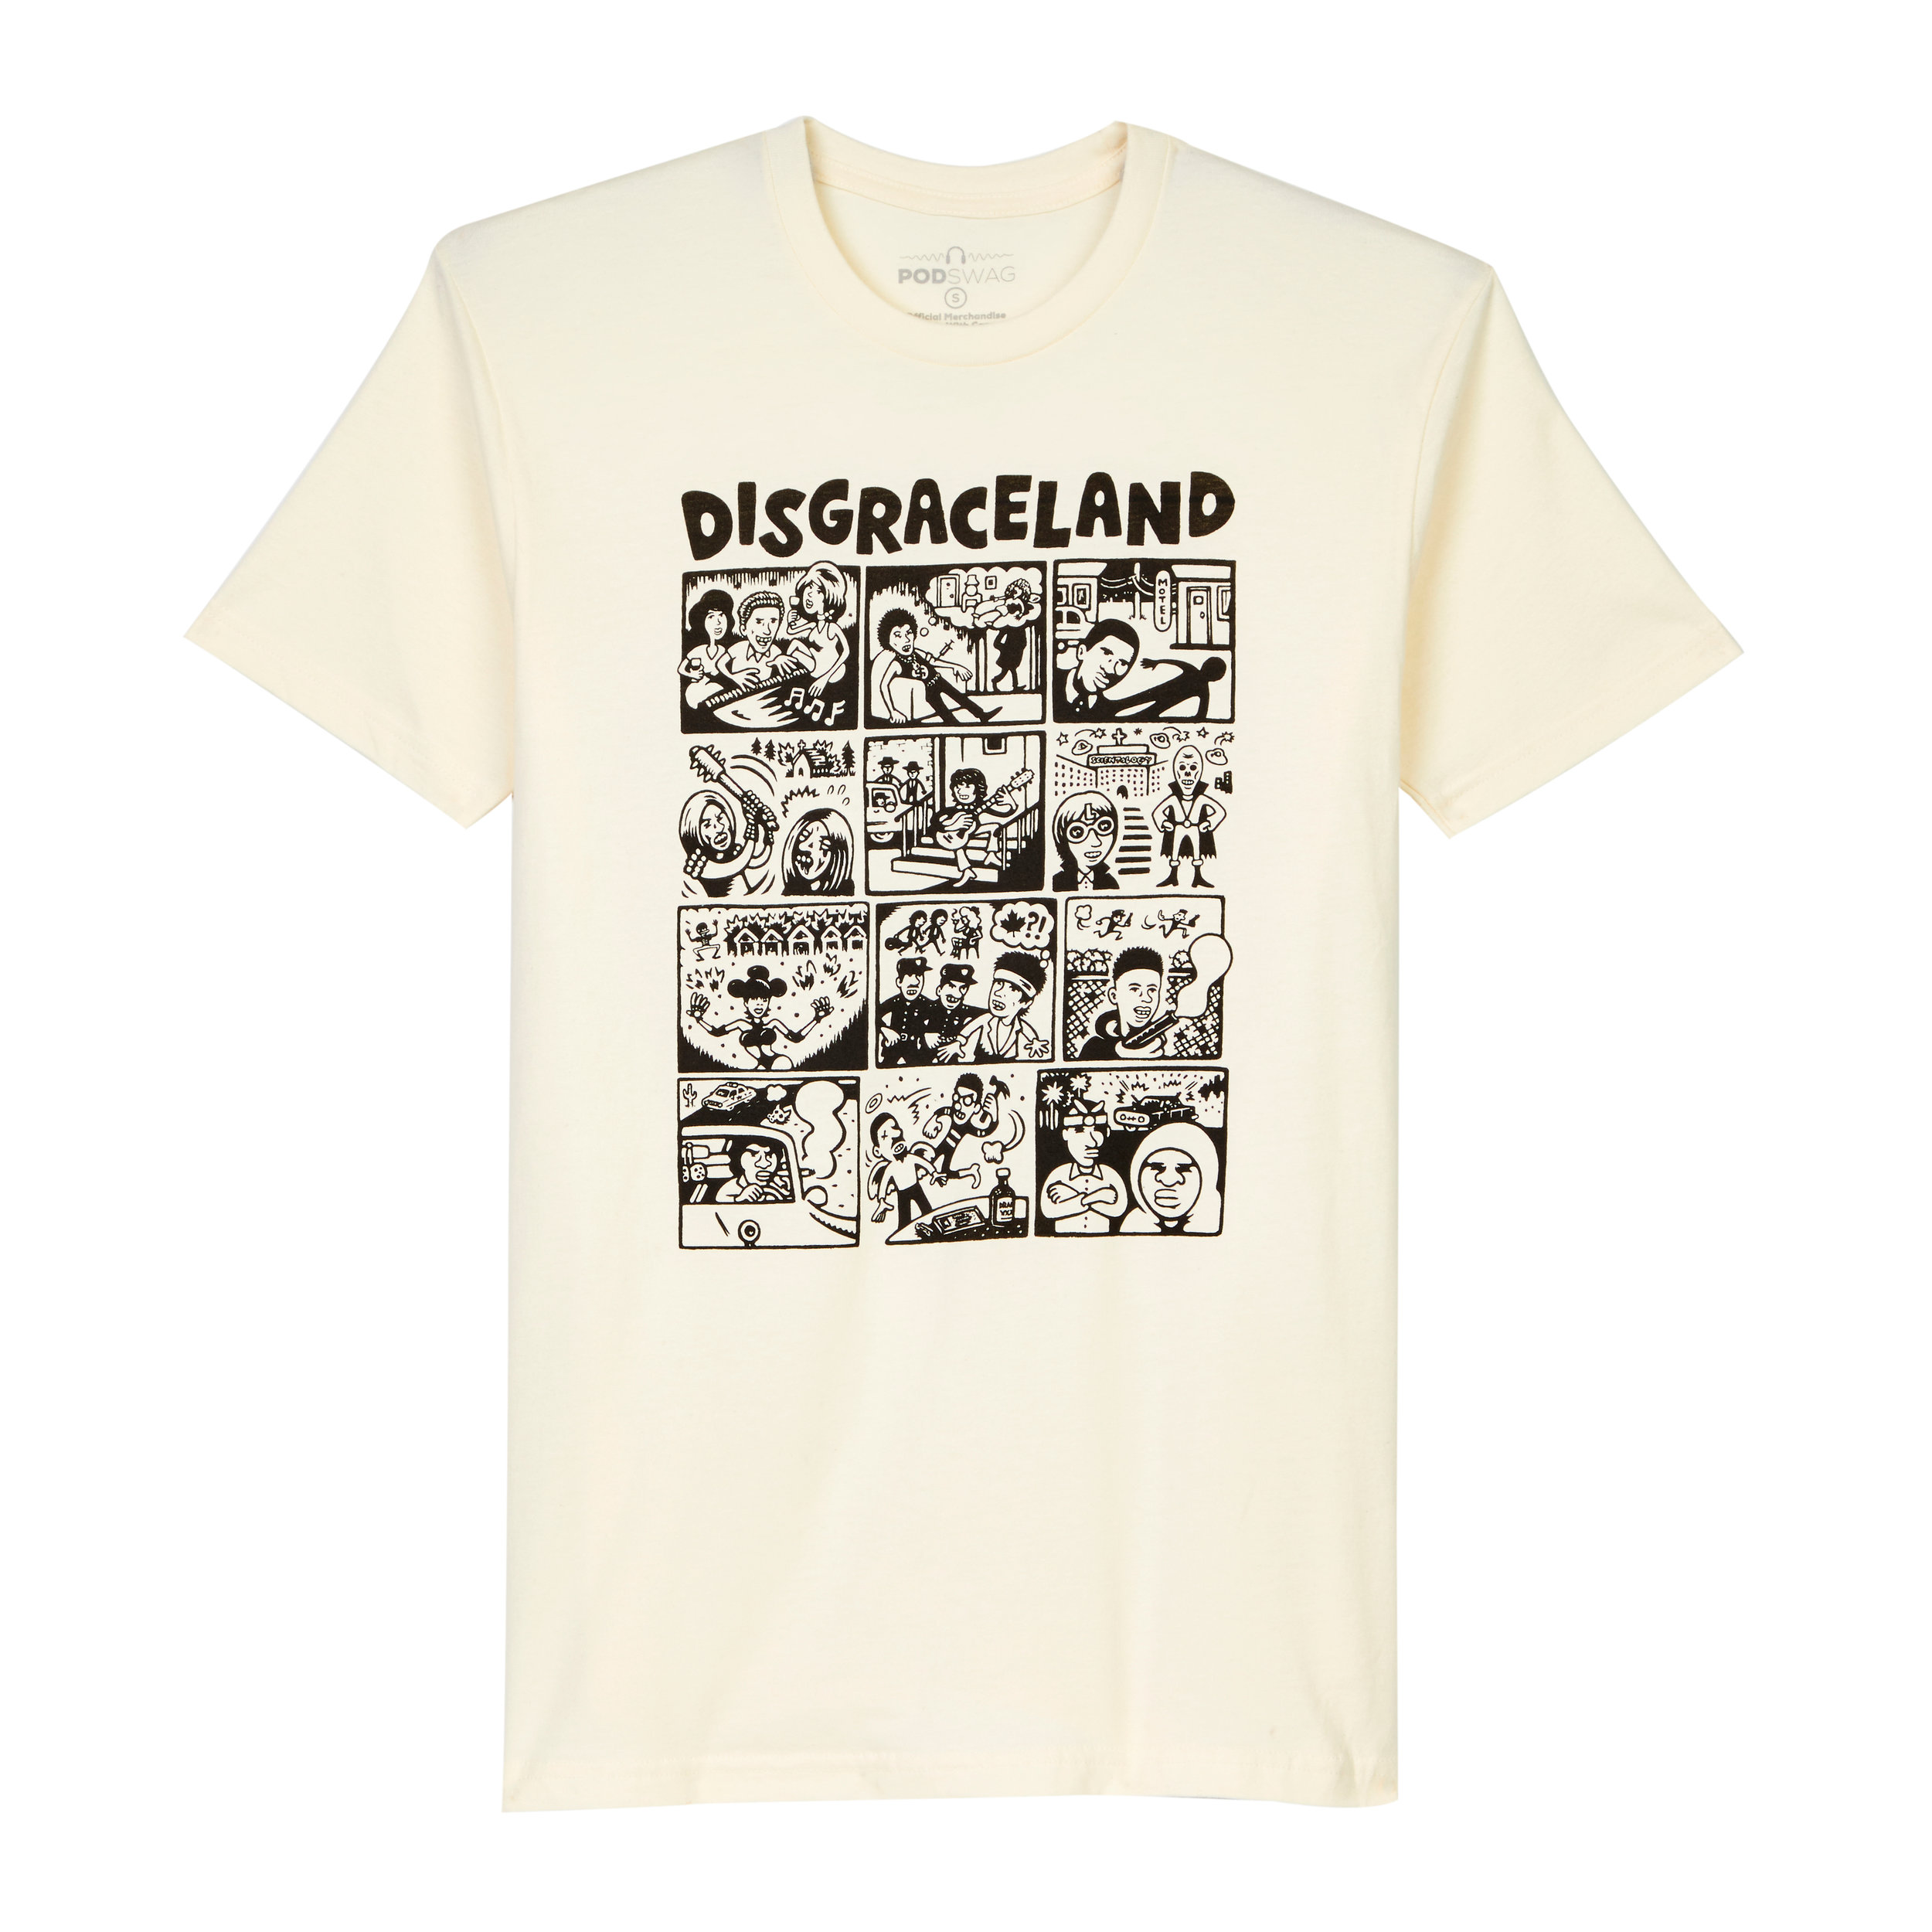 DISGRACELAND-ILLUSTRATION-SHIRT-0324-1.jpg